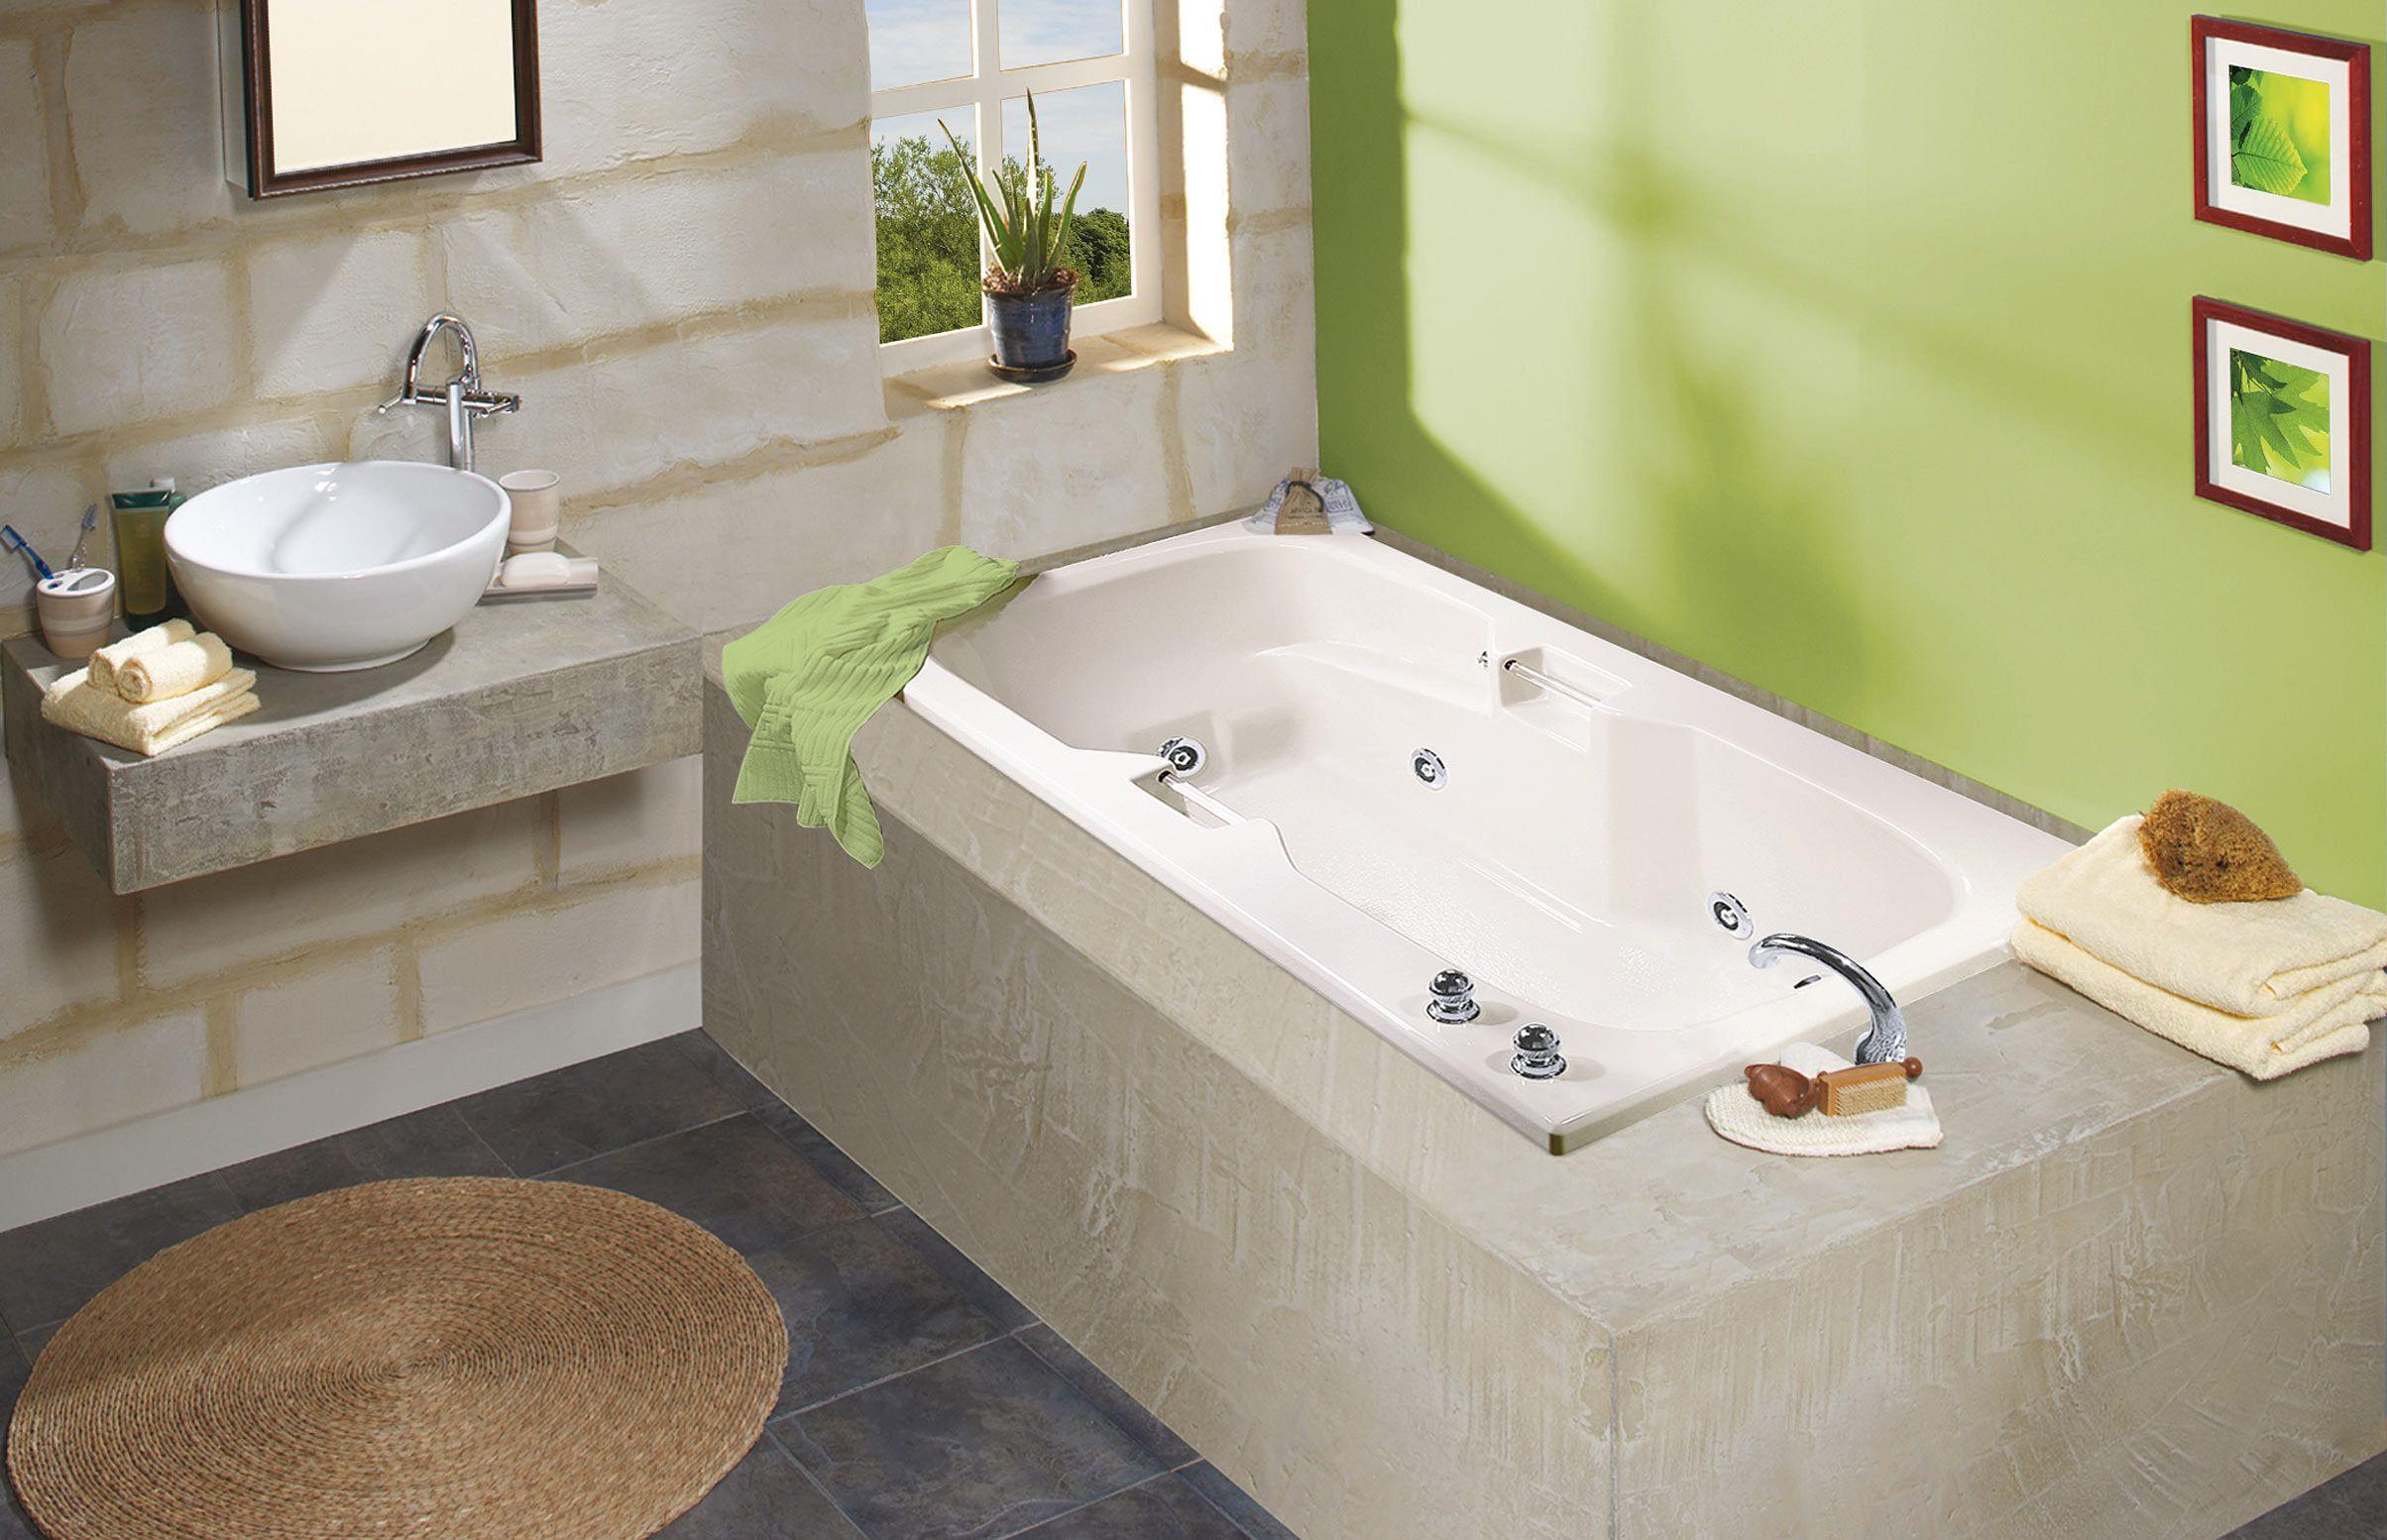 LOPEZ Alcove or Drop-in bathtub - MAAX Professional   Bathroom ...